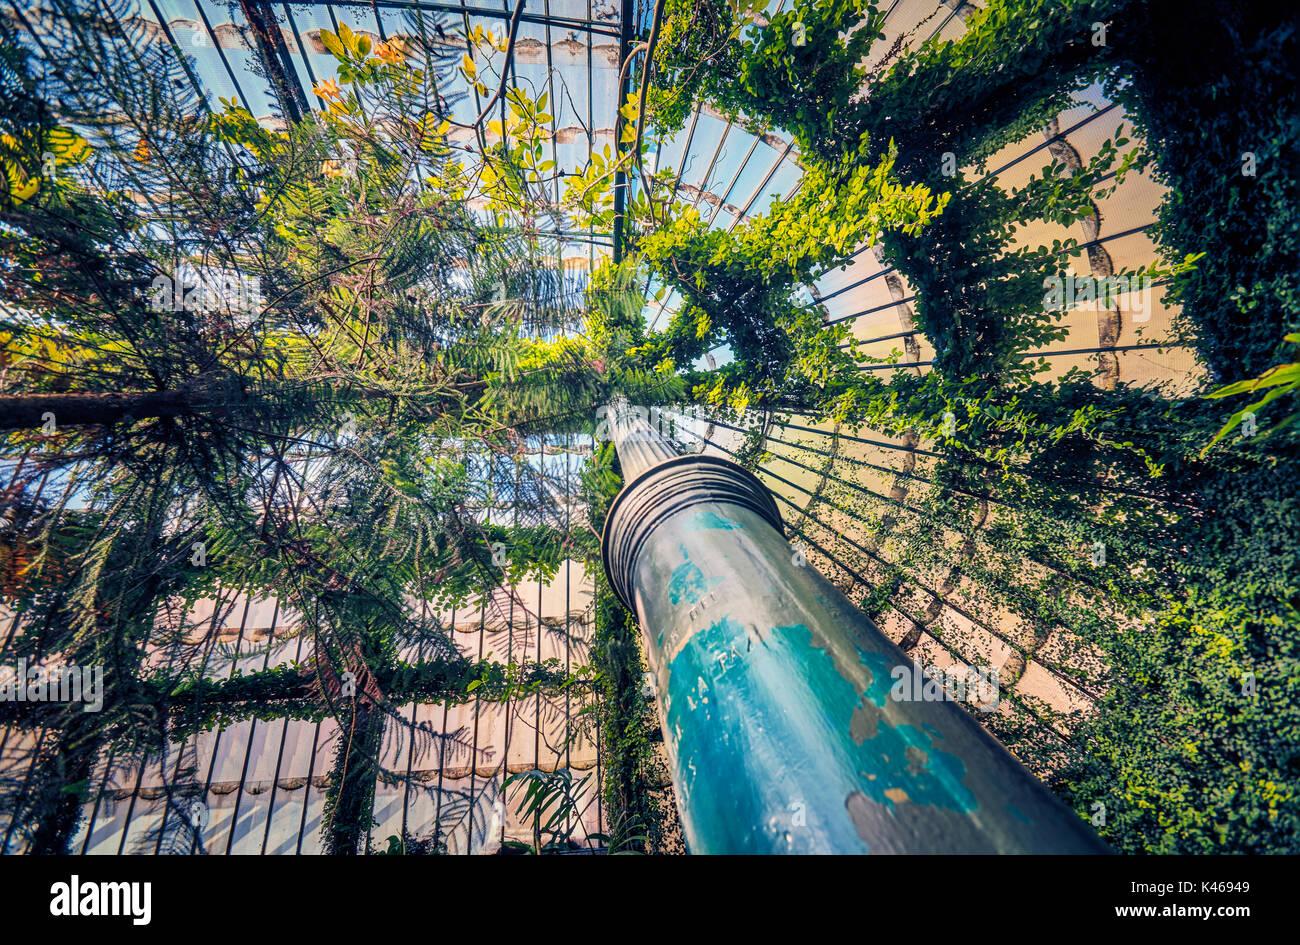 Greenhouse at the Royal Botanical Garden Madrid Spain Stock Photo